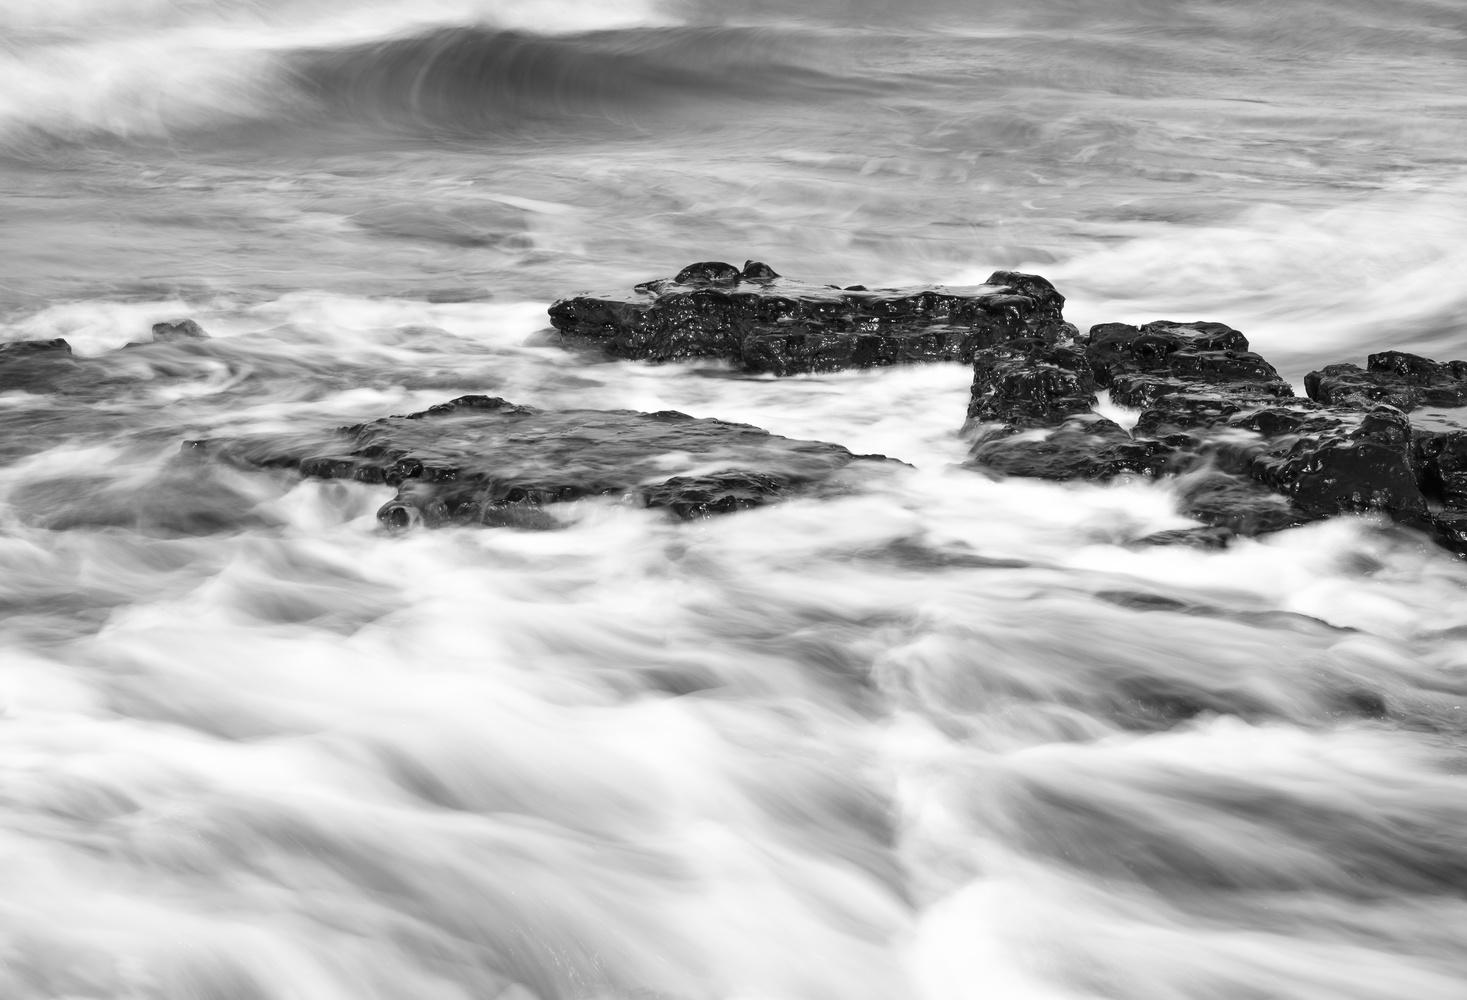 Black Rock Beach 2 by Matt Coppage